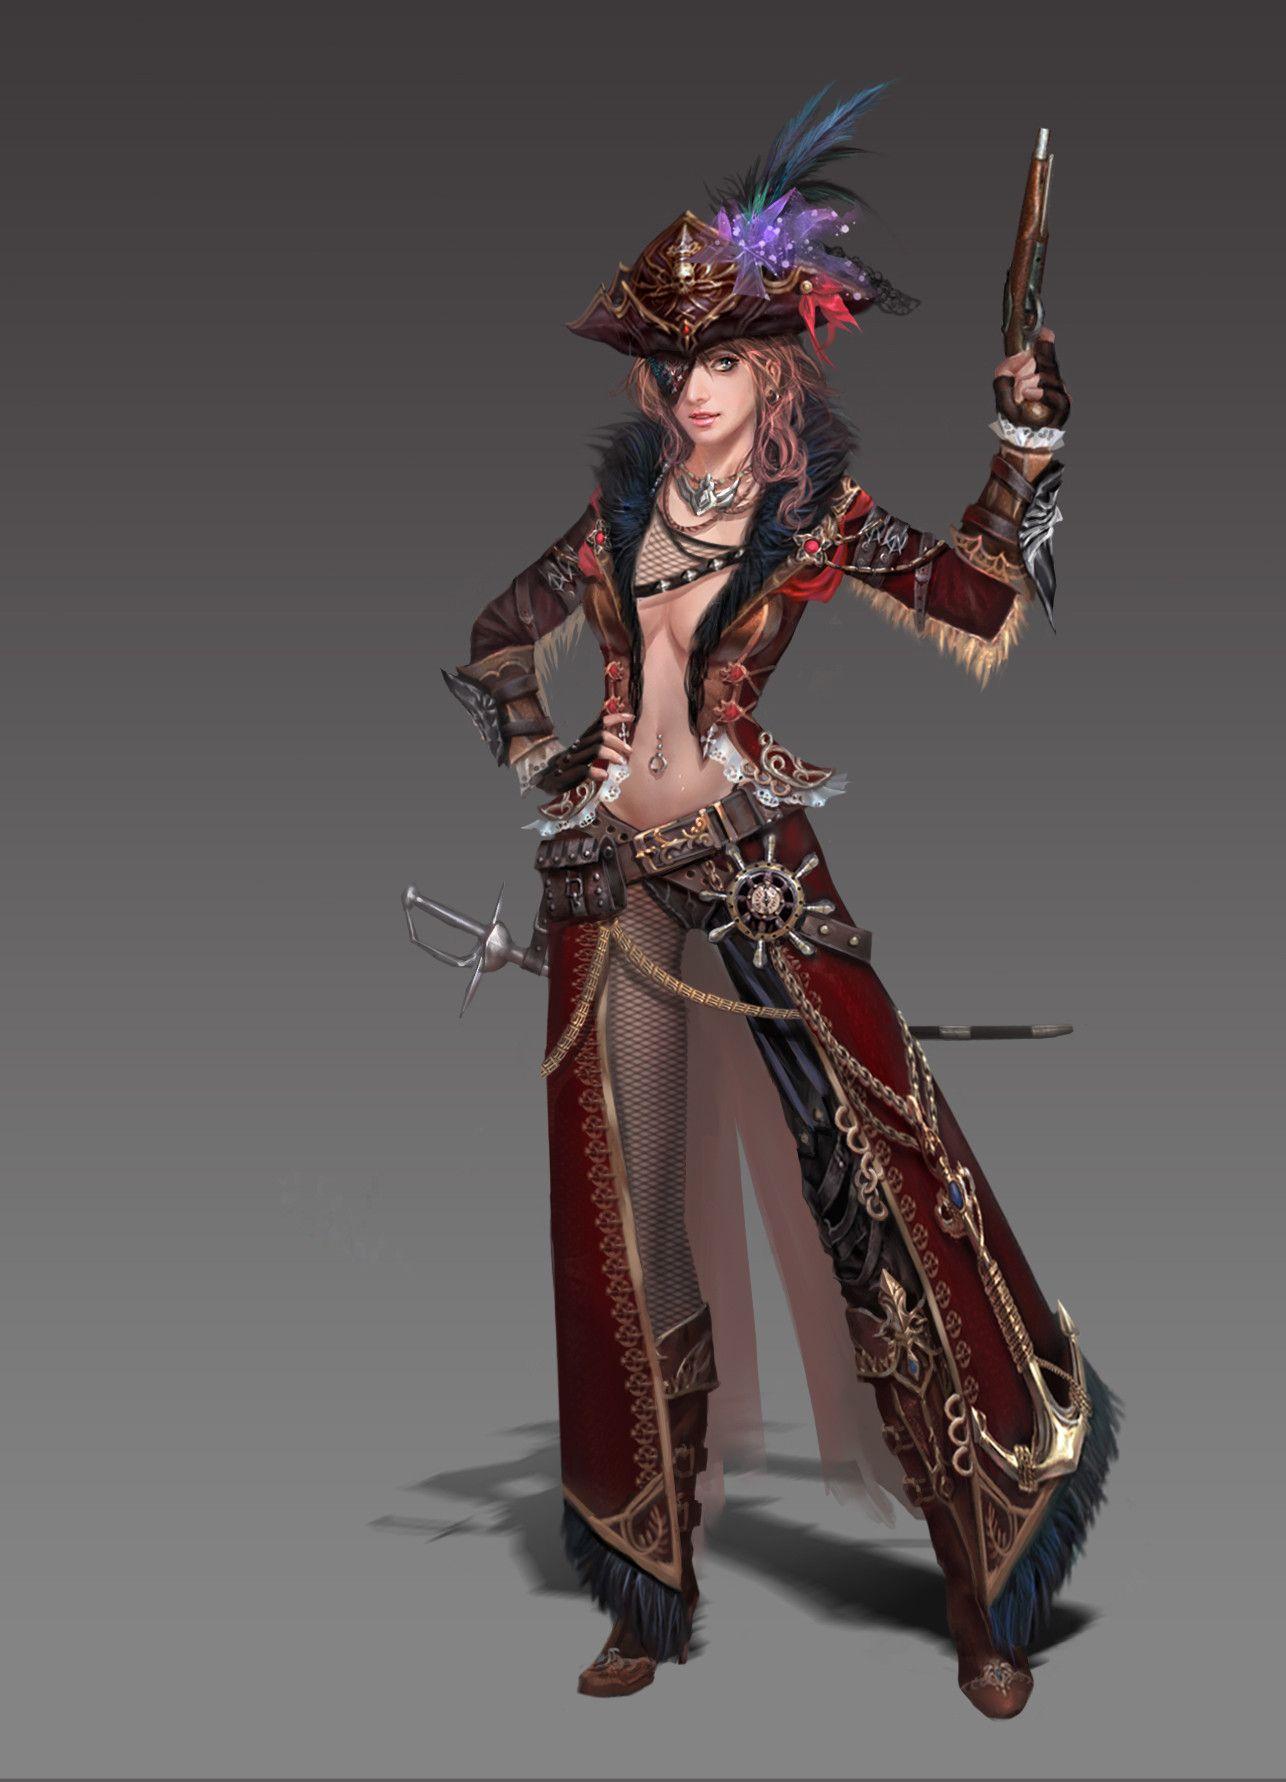 Artstation pirate贰零壹贰 ares 瞋嘉燚 pirate art